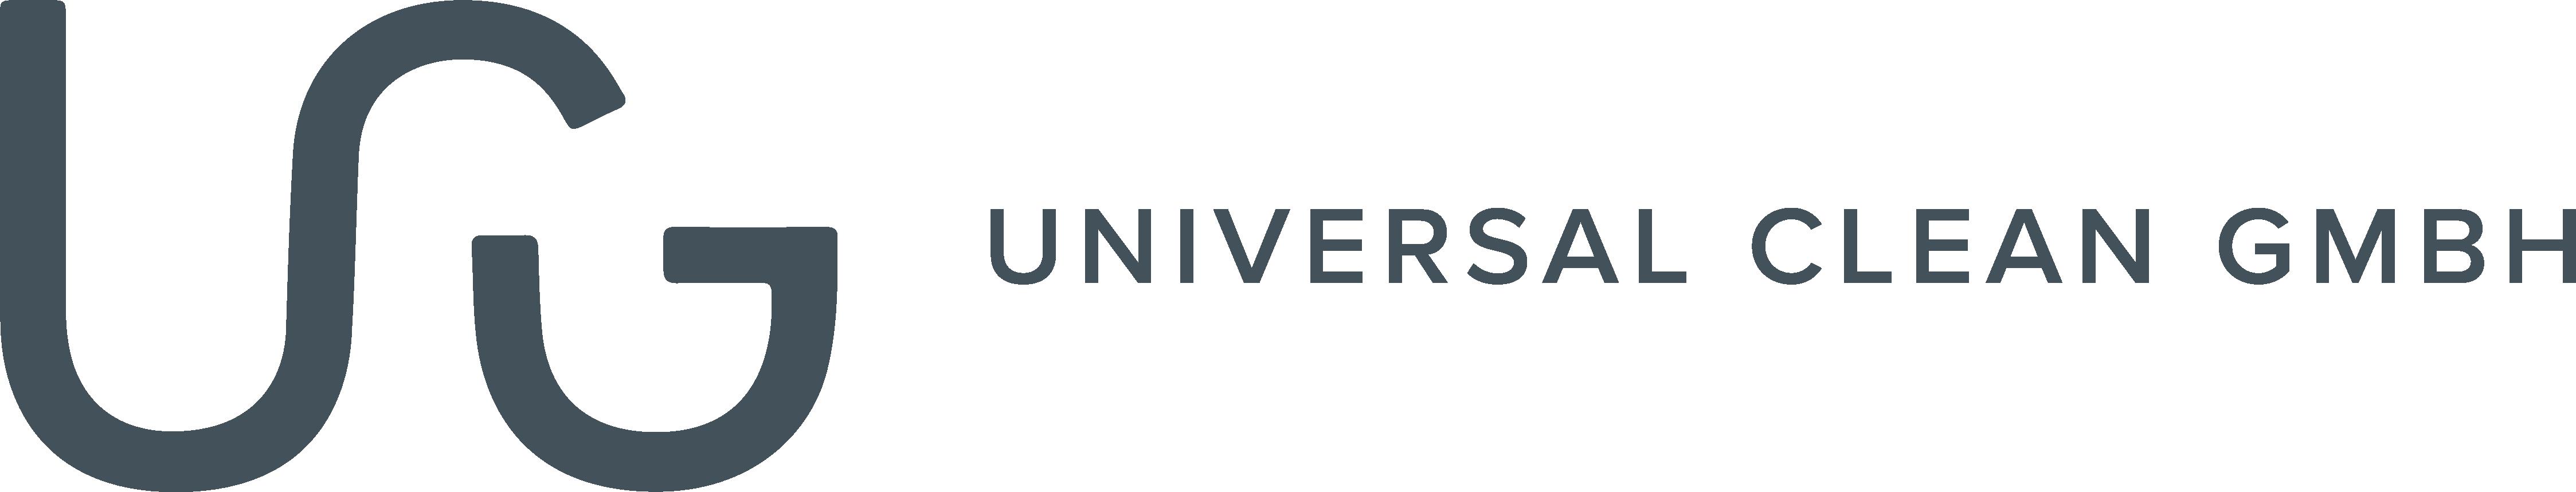 https://fckilia.de/wp-content/uploads/2021/08/UCG_Logo.png